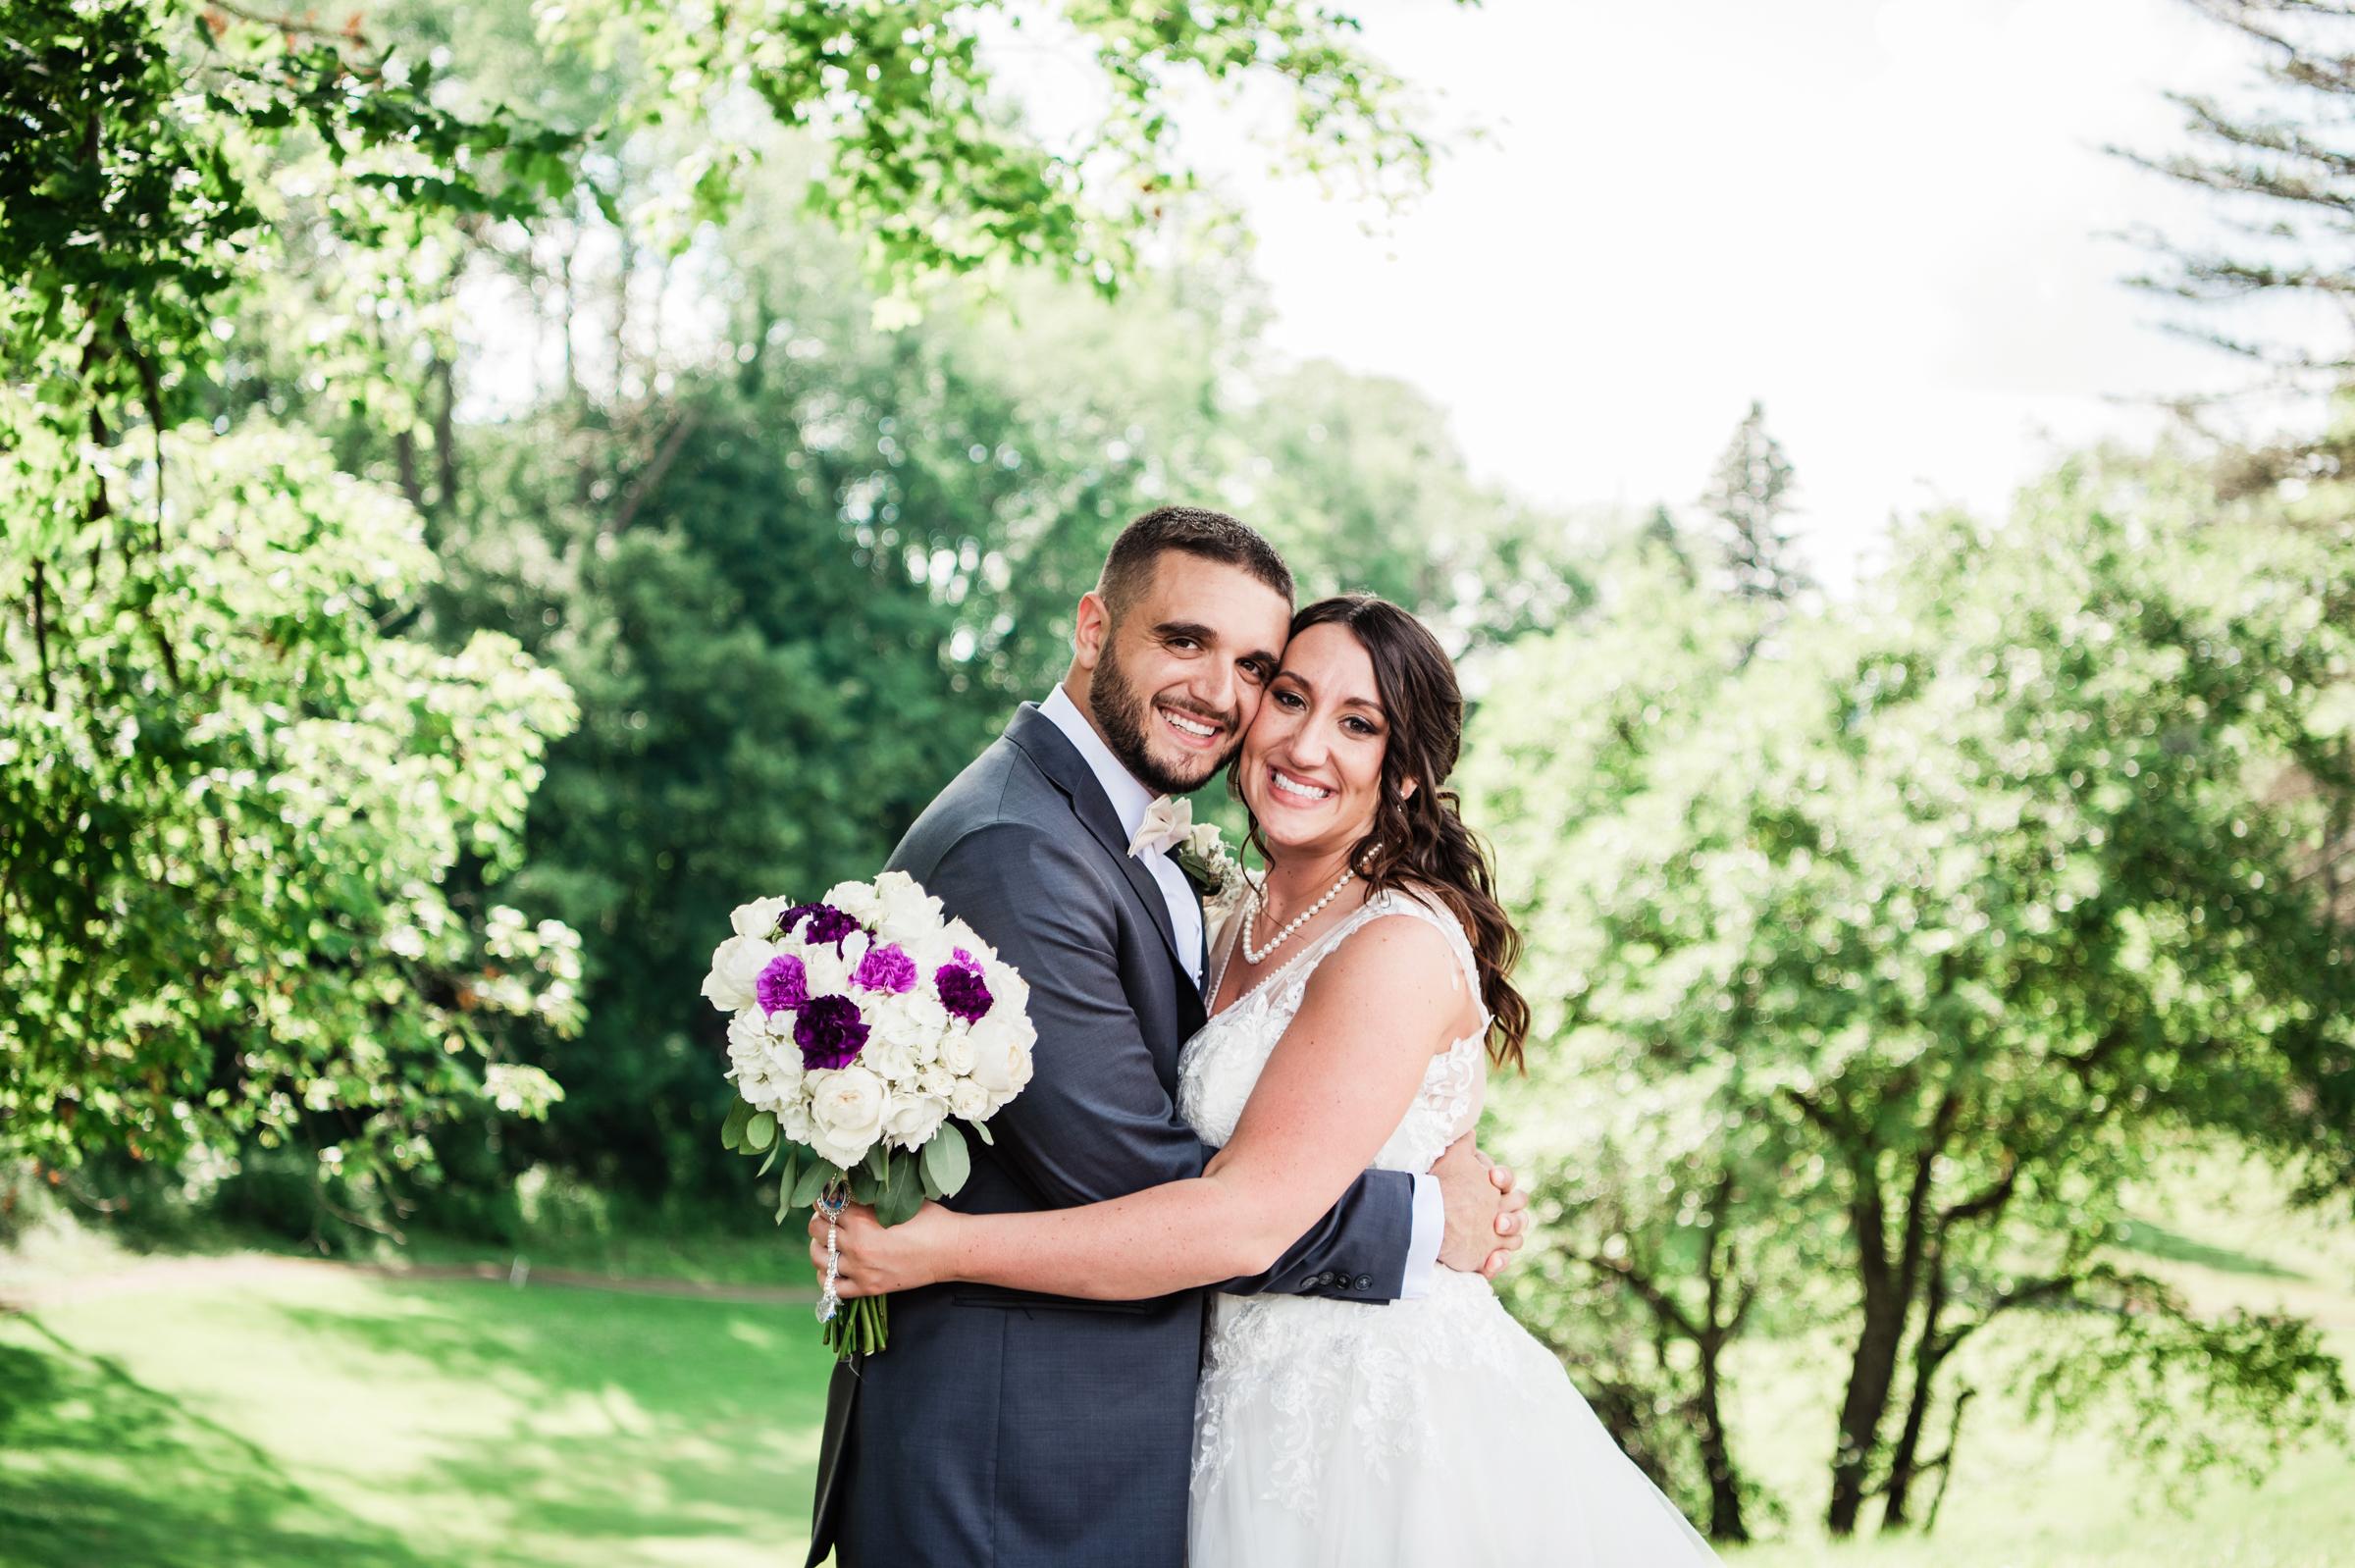 Historic_Old_St_Johns_Church_Valentinos_Banquet_Hall_Central_NY_Wedding_JILL_STUDIO_Rochester_NY_Photographer_DSC_6231.jpg